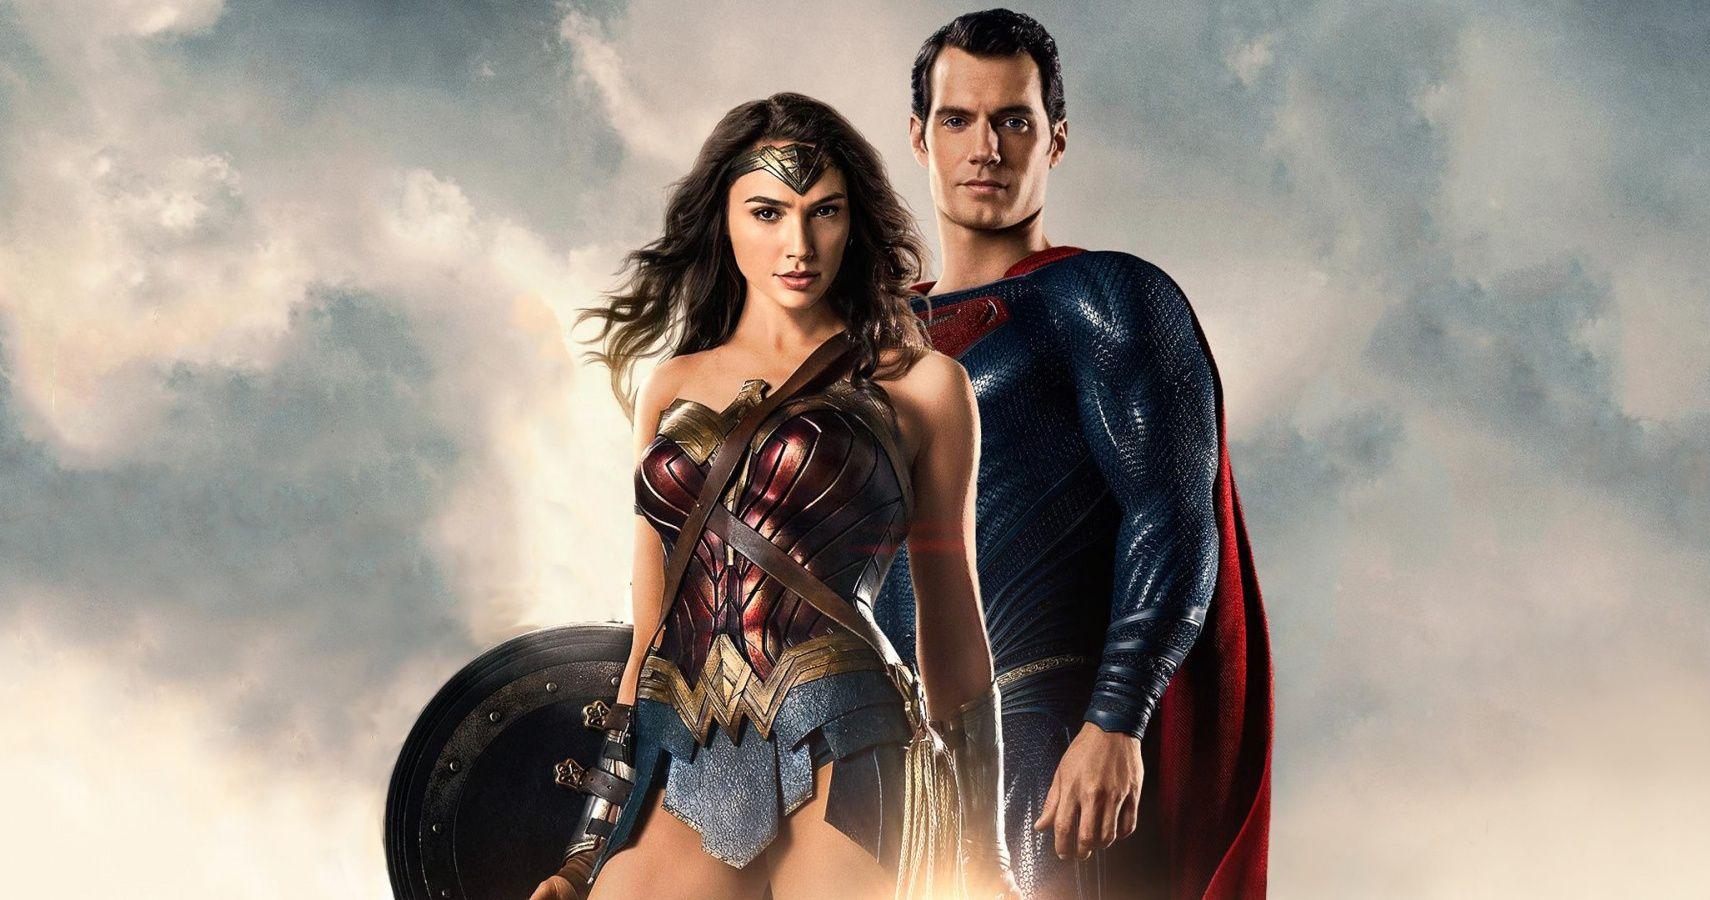 10 Questions About Superman & Wonder Womans Relationship